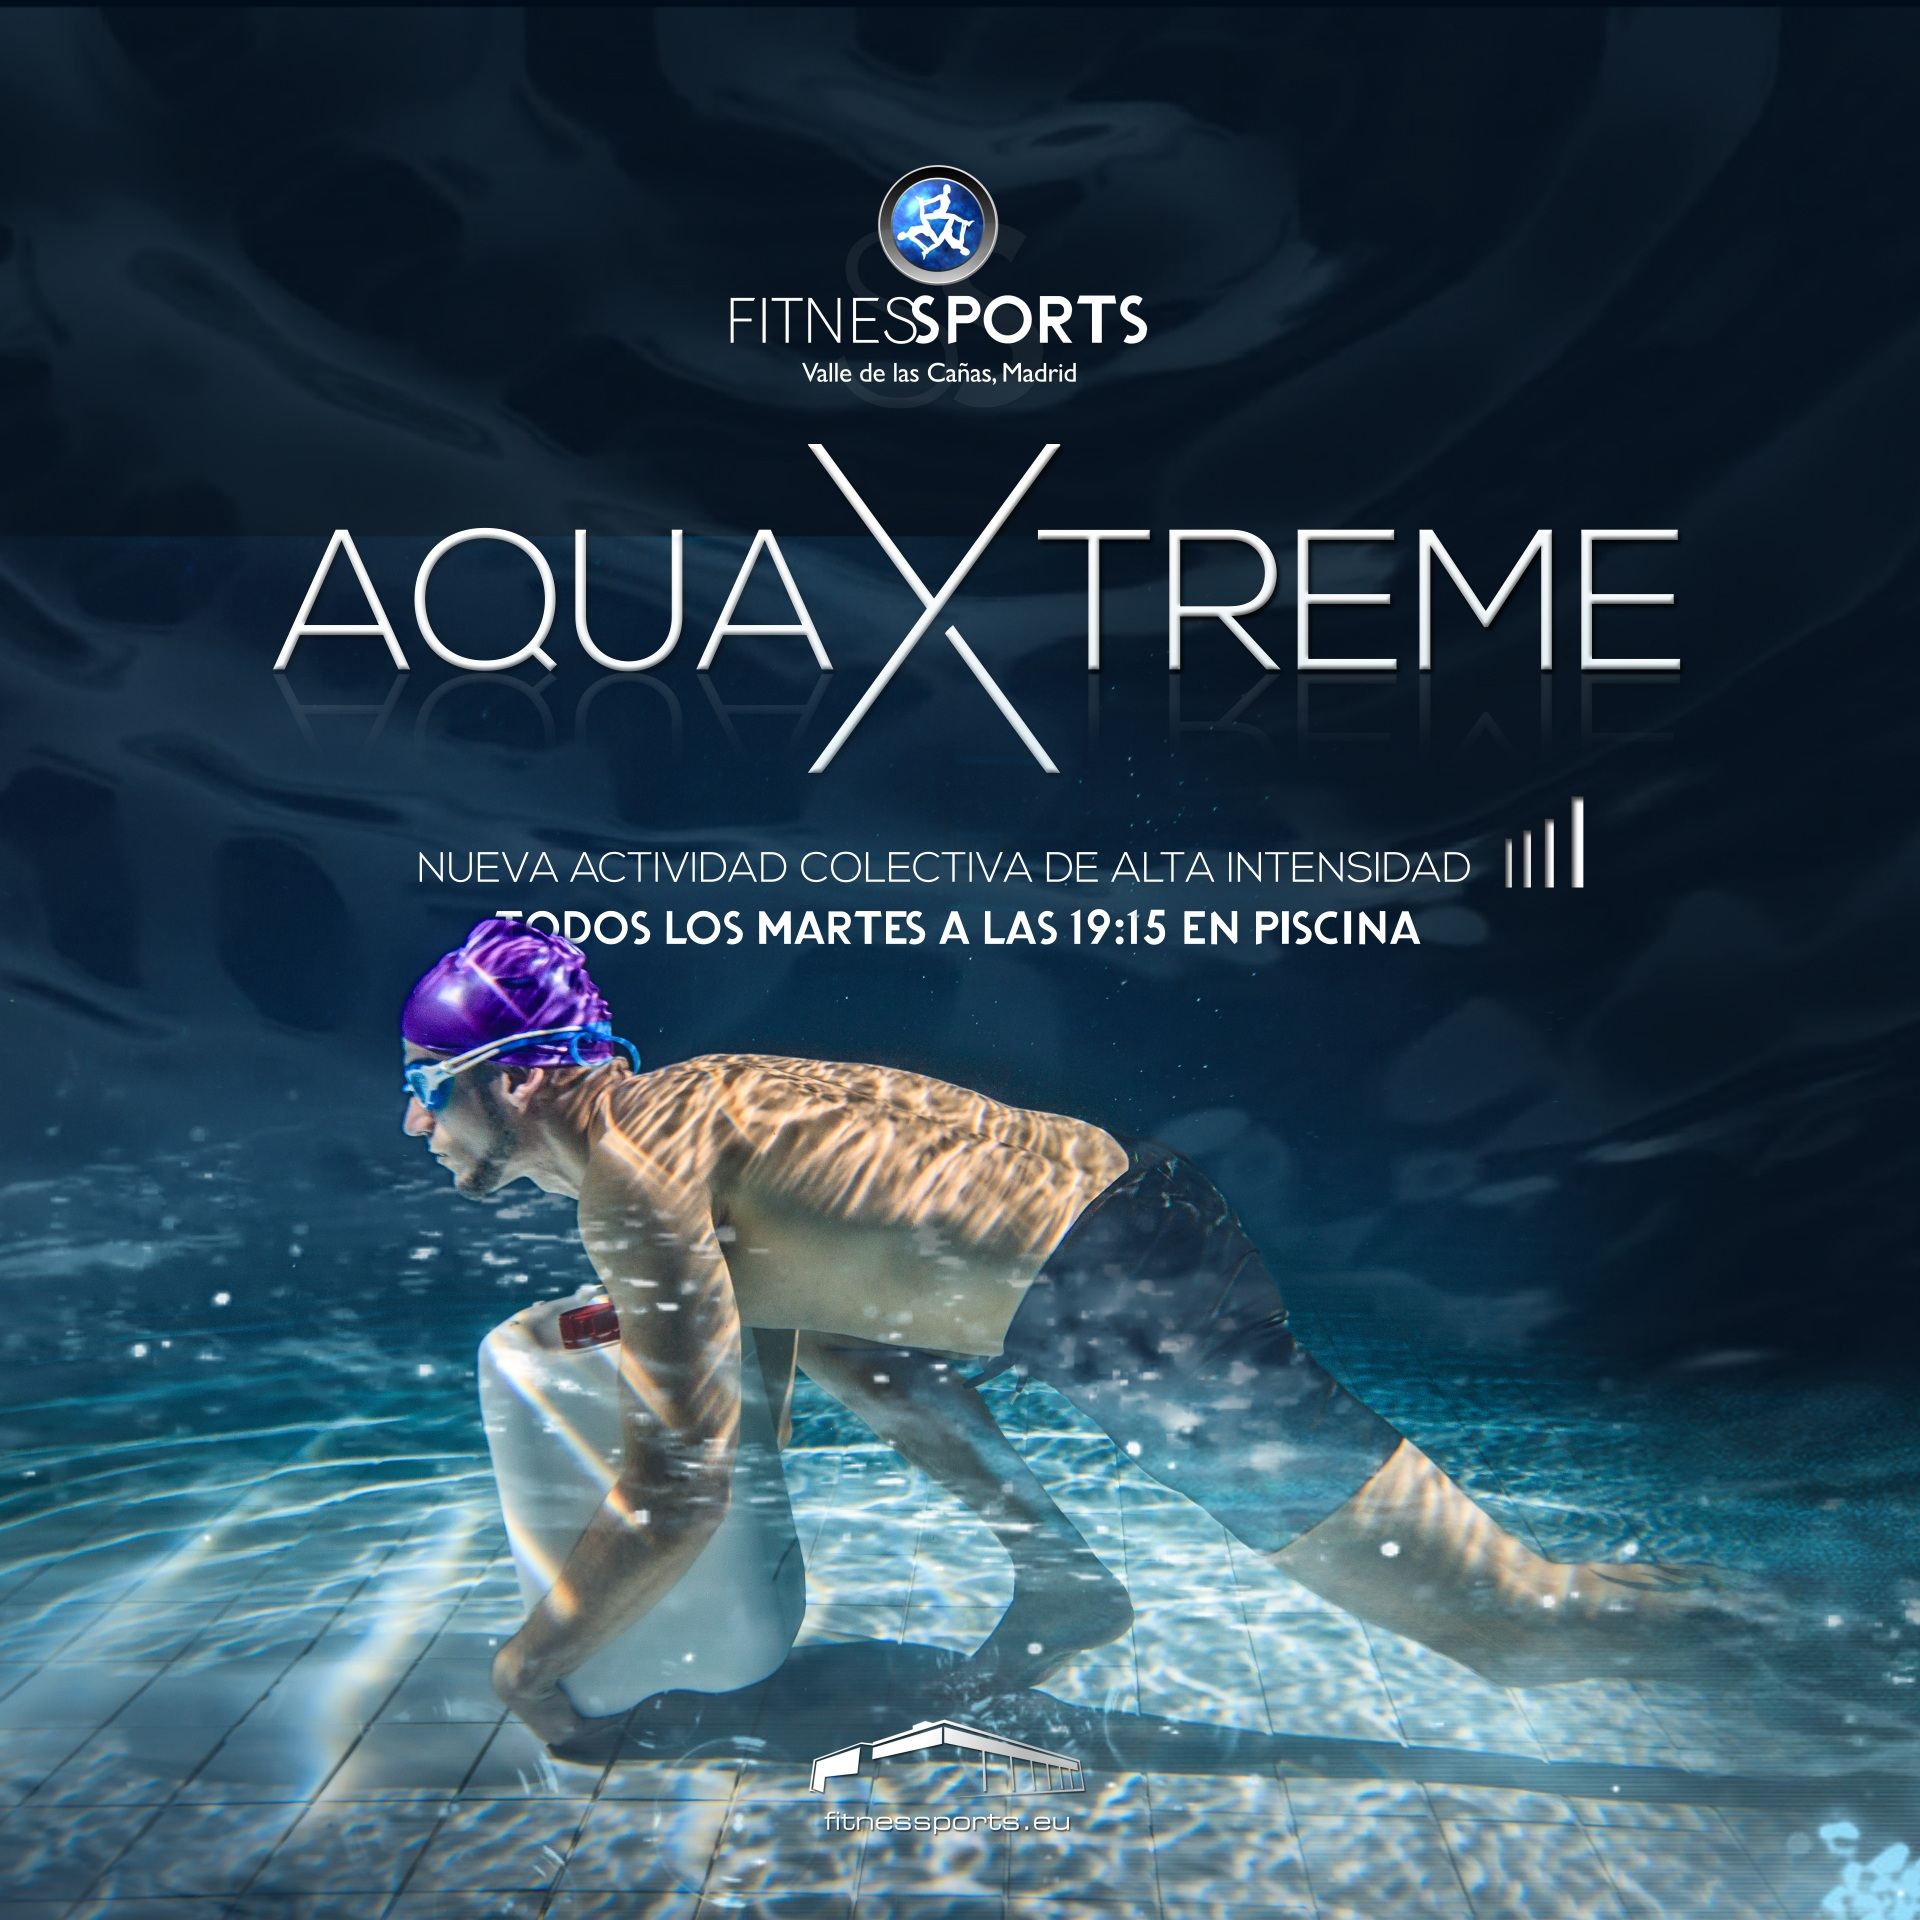 aquaxtreme-atividad-piscina-fitness-sports-valle-las-canas-gimnasio-en-madrid-2016-box